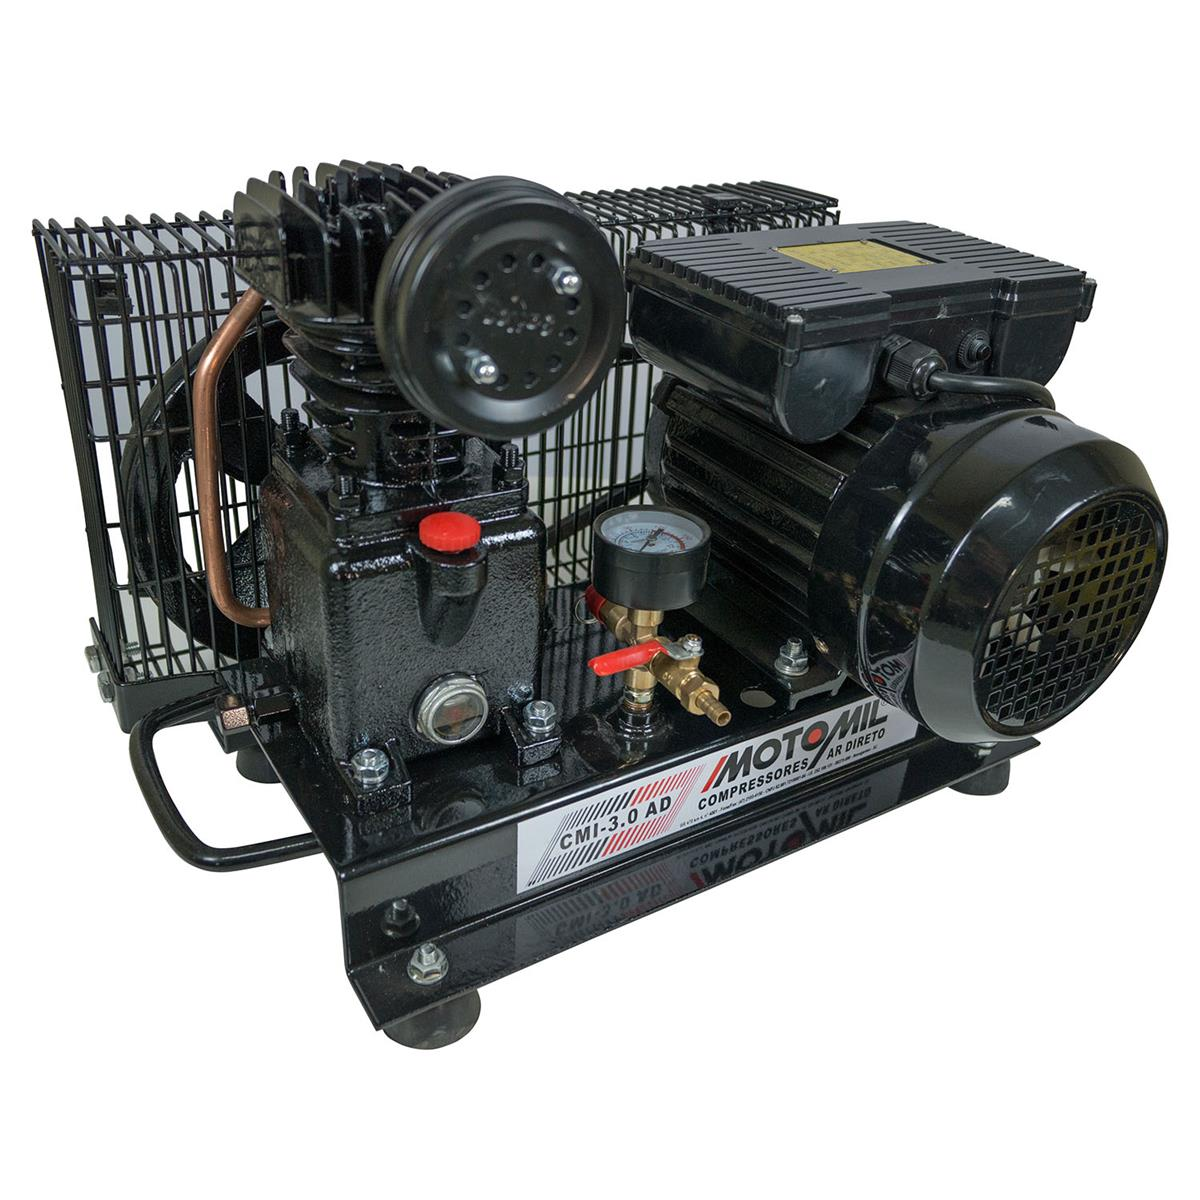 9b59ef72fd99c0 Compressor De Ar Direto Com Motor 1Hp 4p Bivolt CMI-3.0AD Motomil na  Estrela10